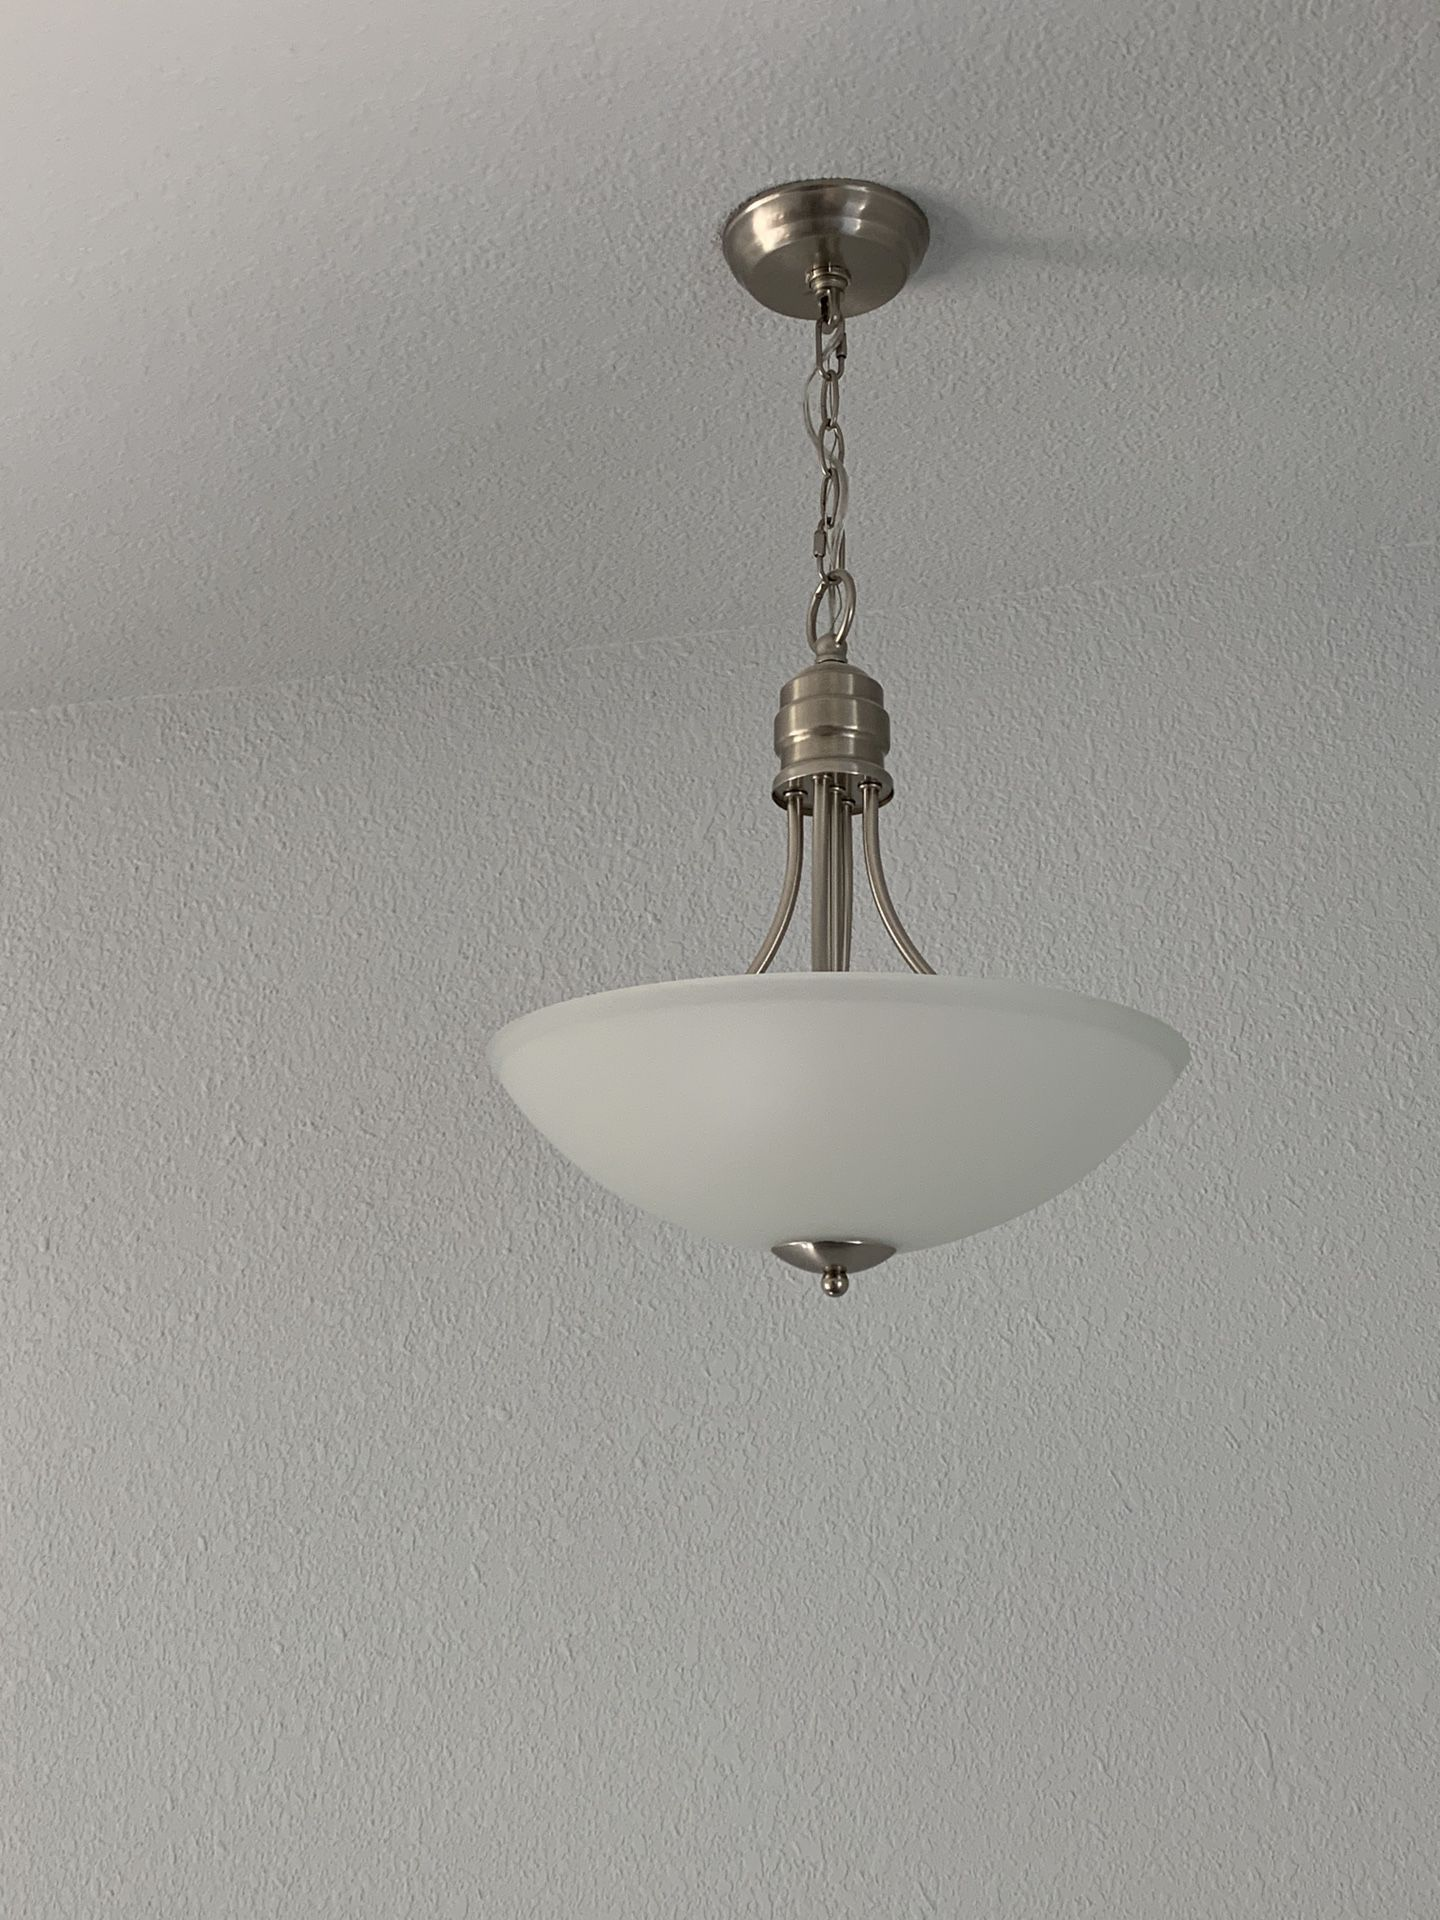 Brand new light chandelier